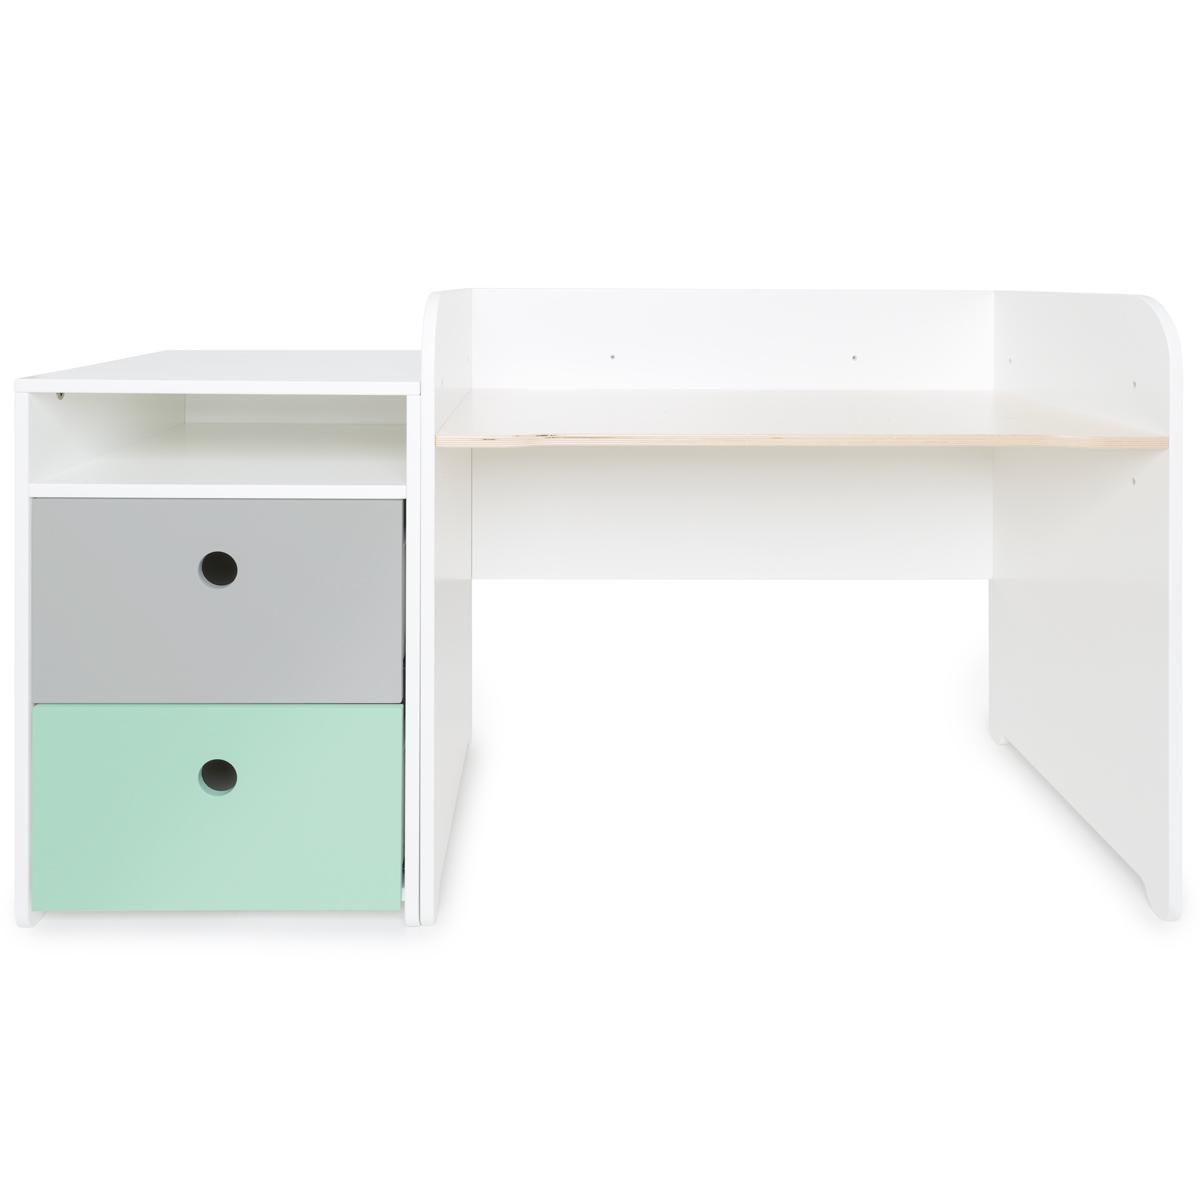 Escritorio evolutivo-mueble pequeño 2 cajones COLORFLEX Abitare Kids pearl grey-mint